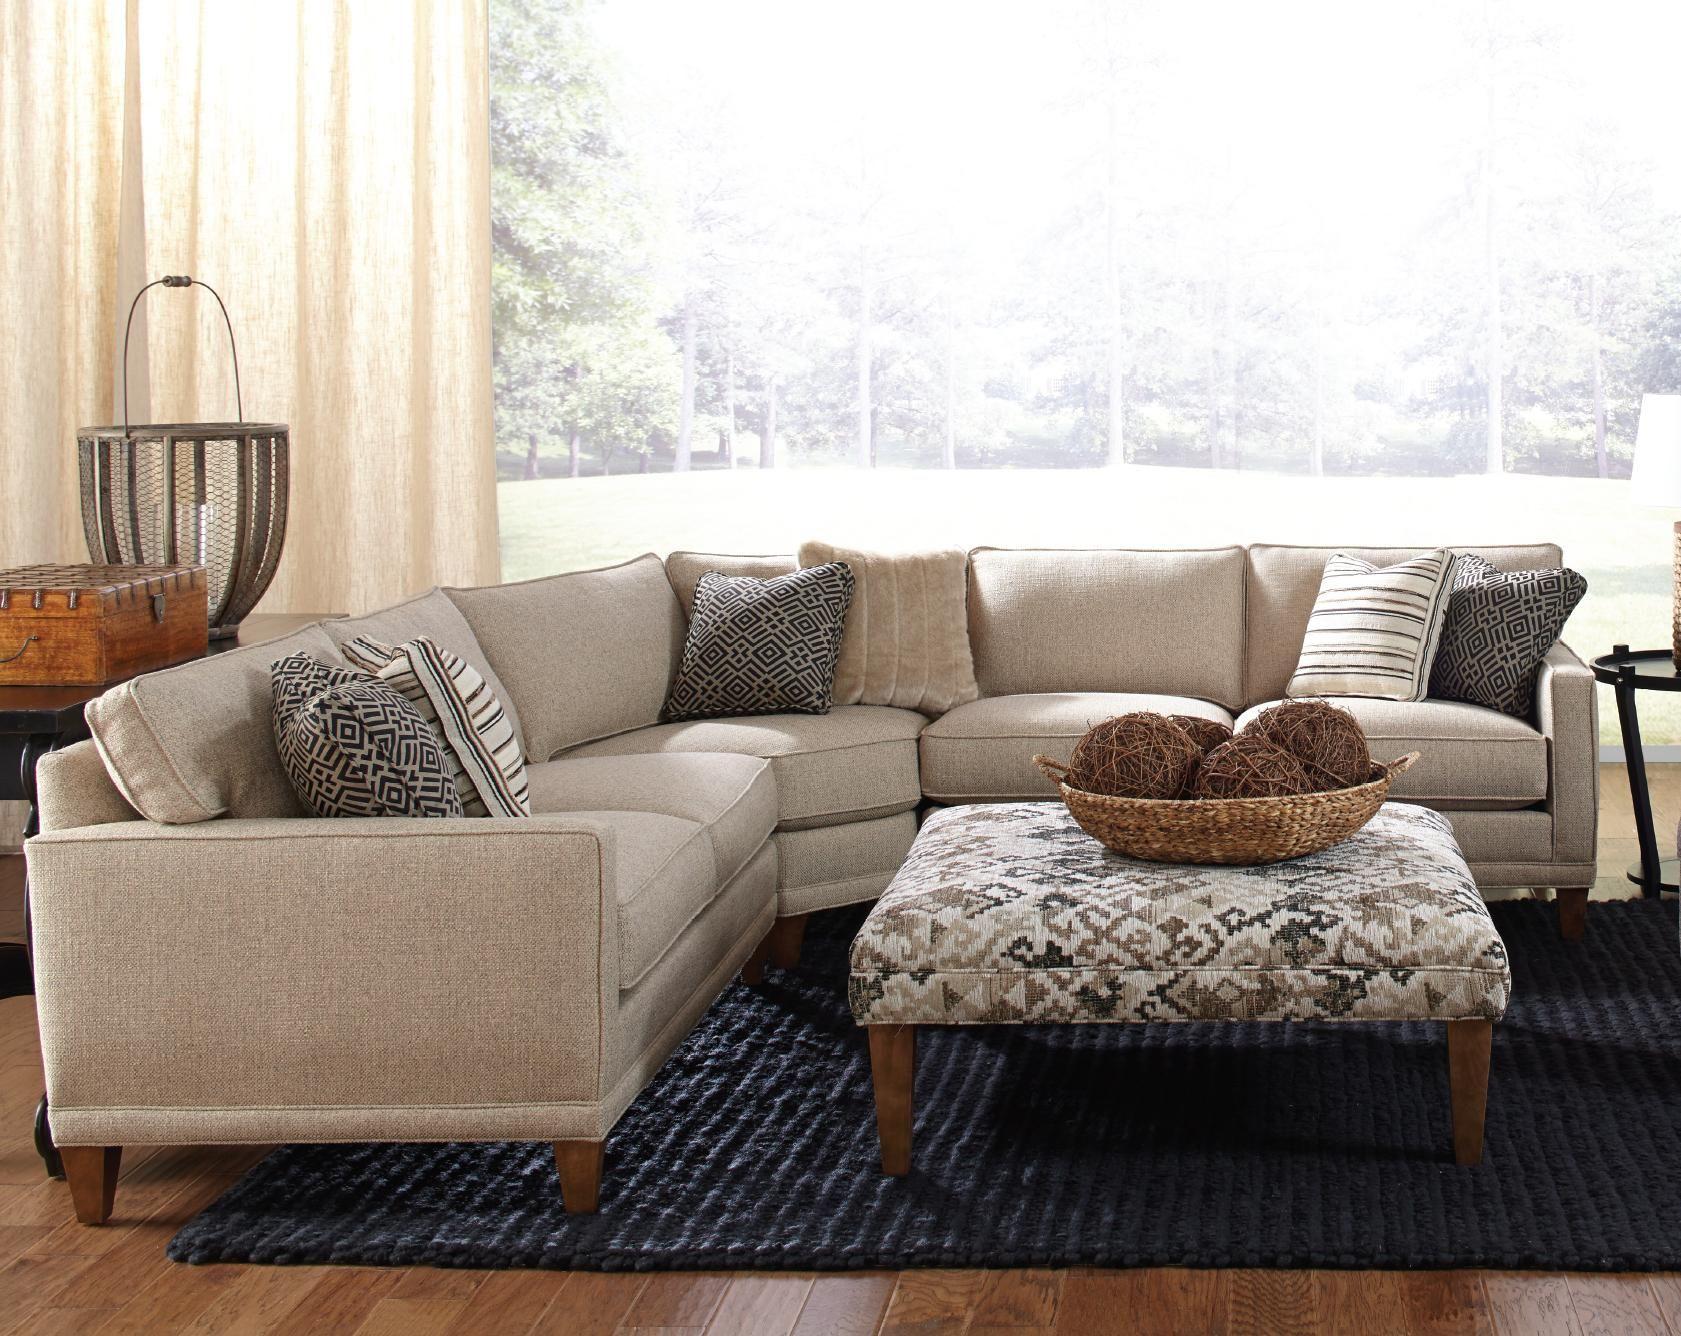 Rowe Townsend Contemporary 3 Piece Sectional Sofa - Sprintz ...